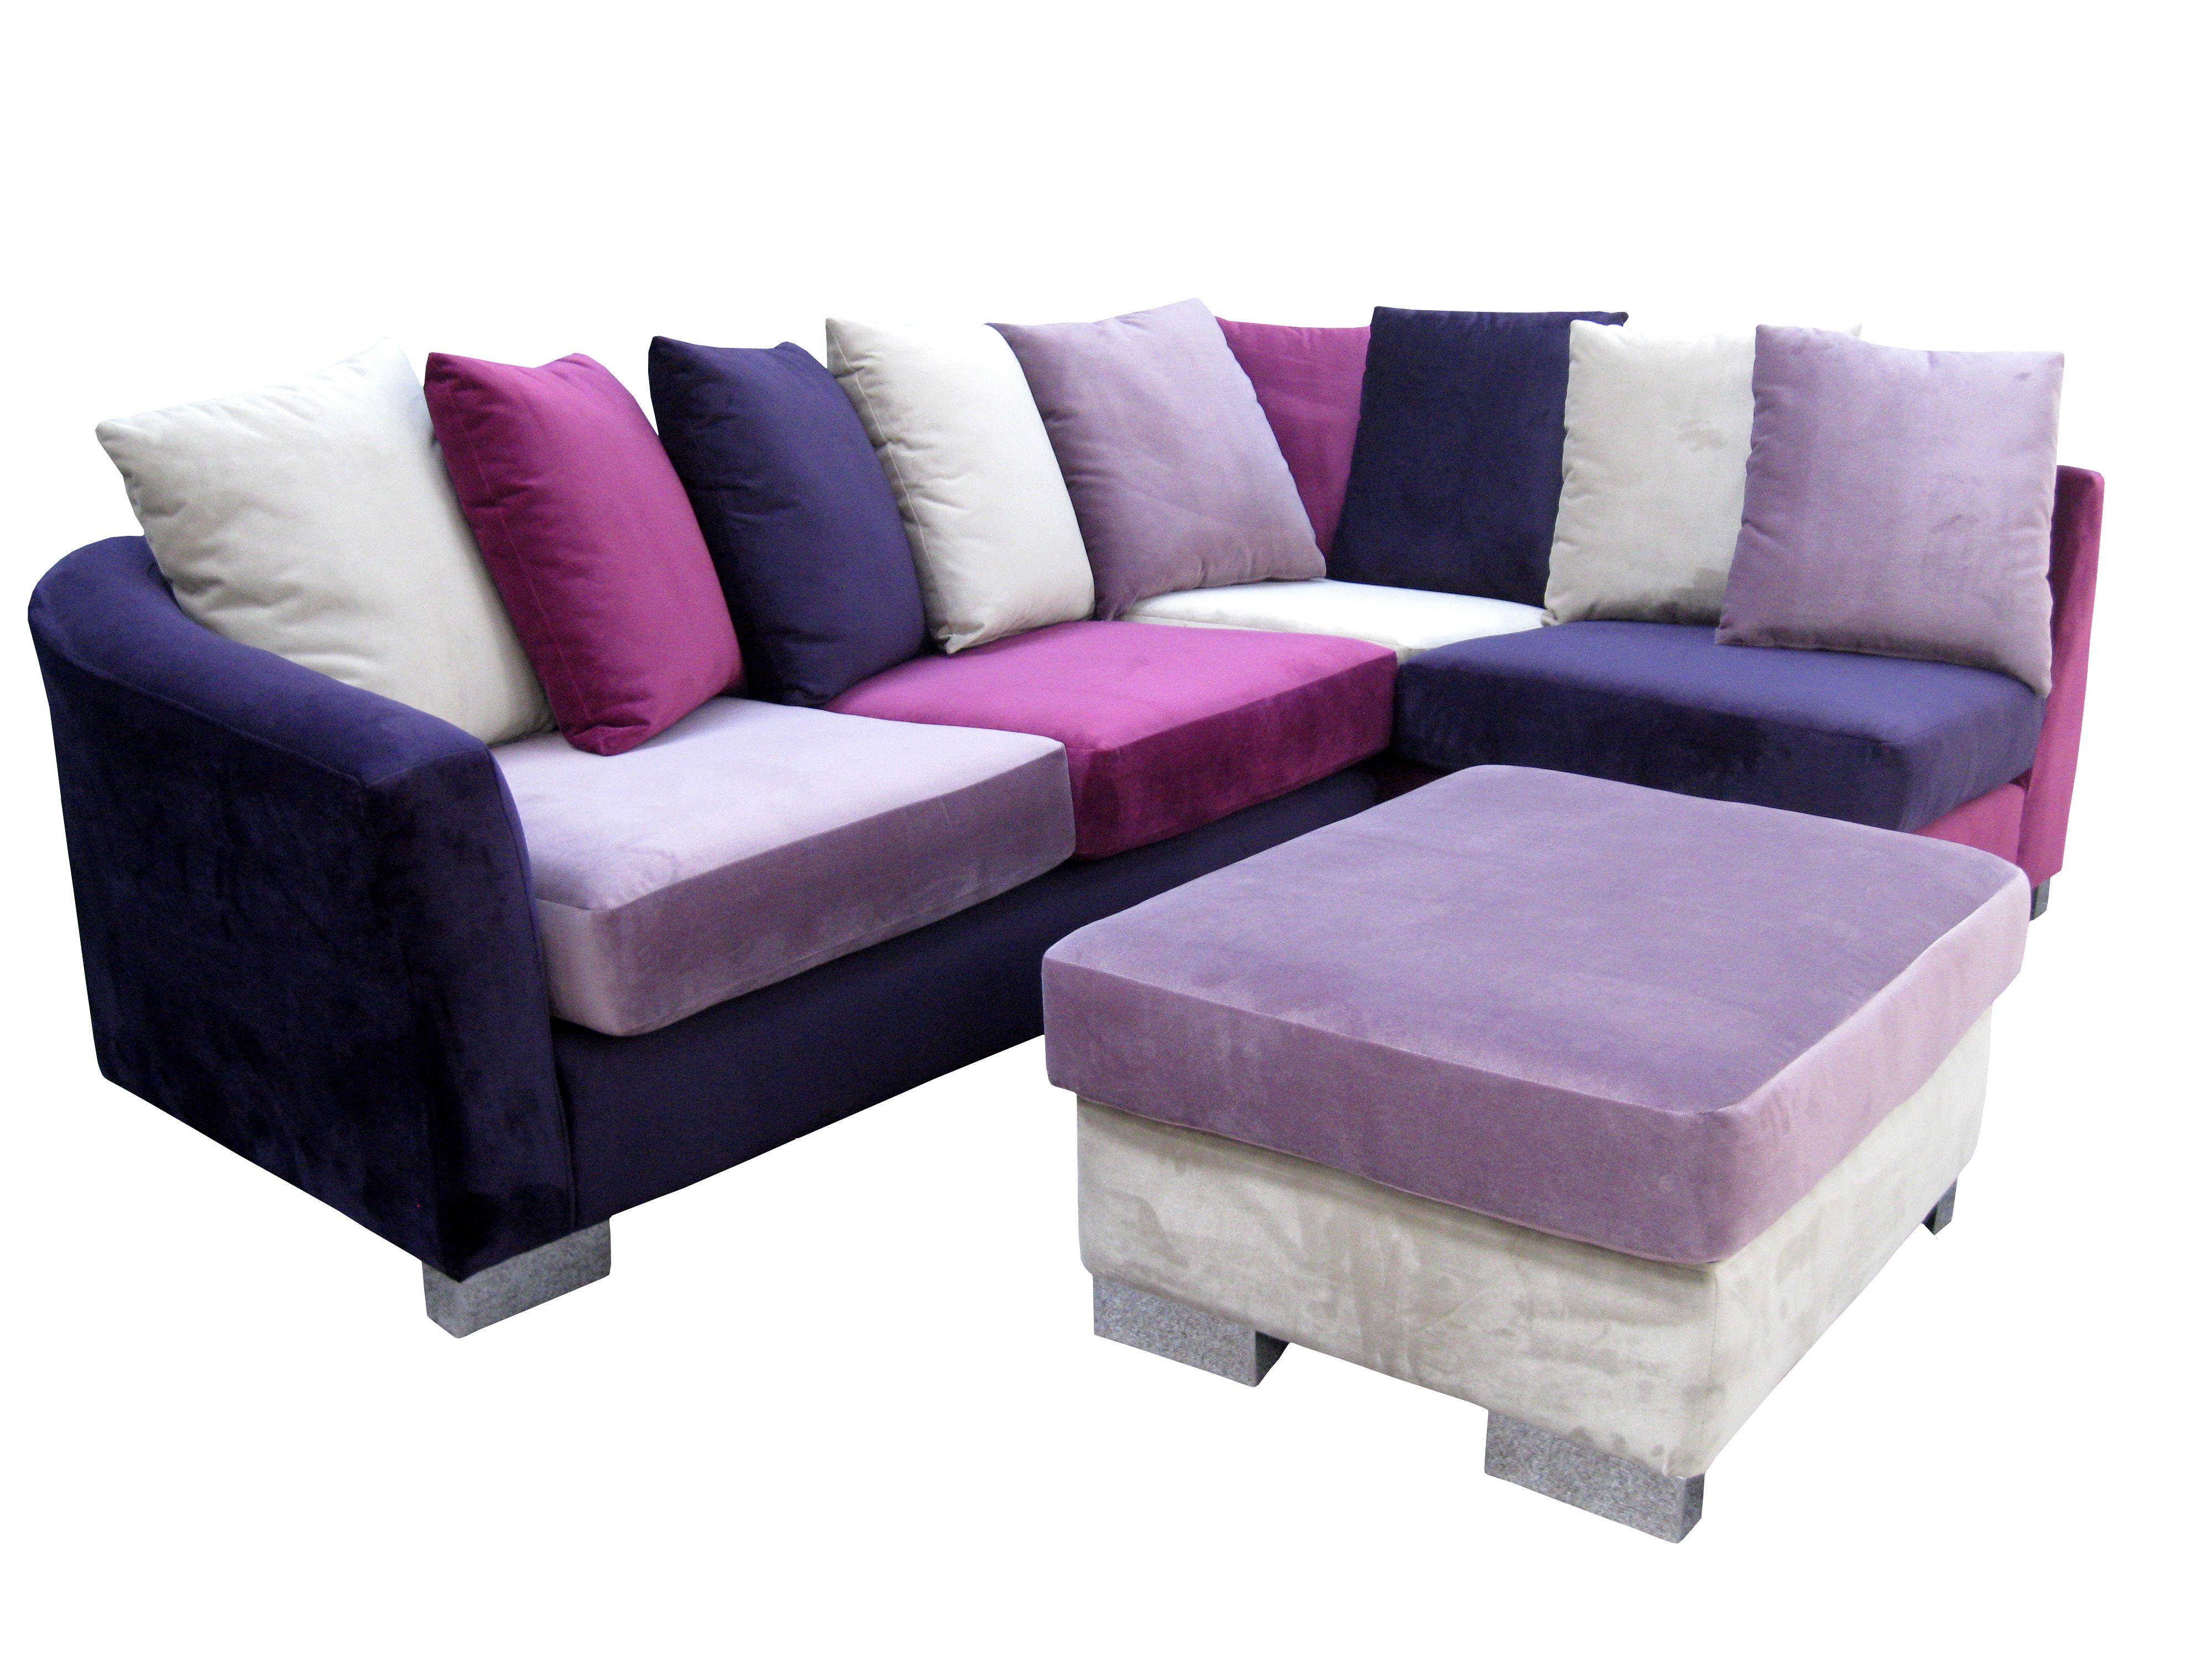 purple corner sofa bed australian made beds adelaide multi coloured zara and footstool